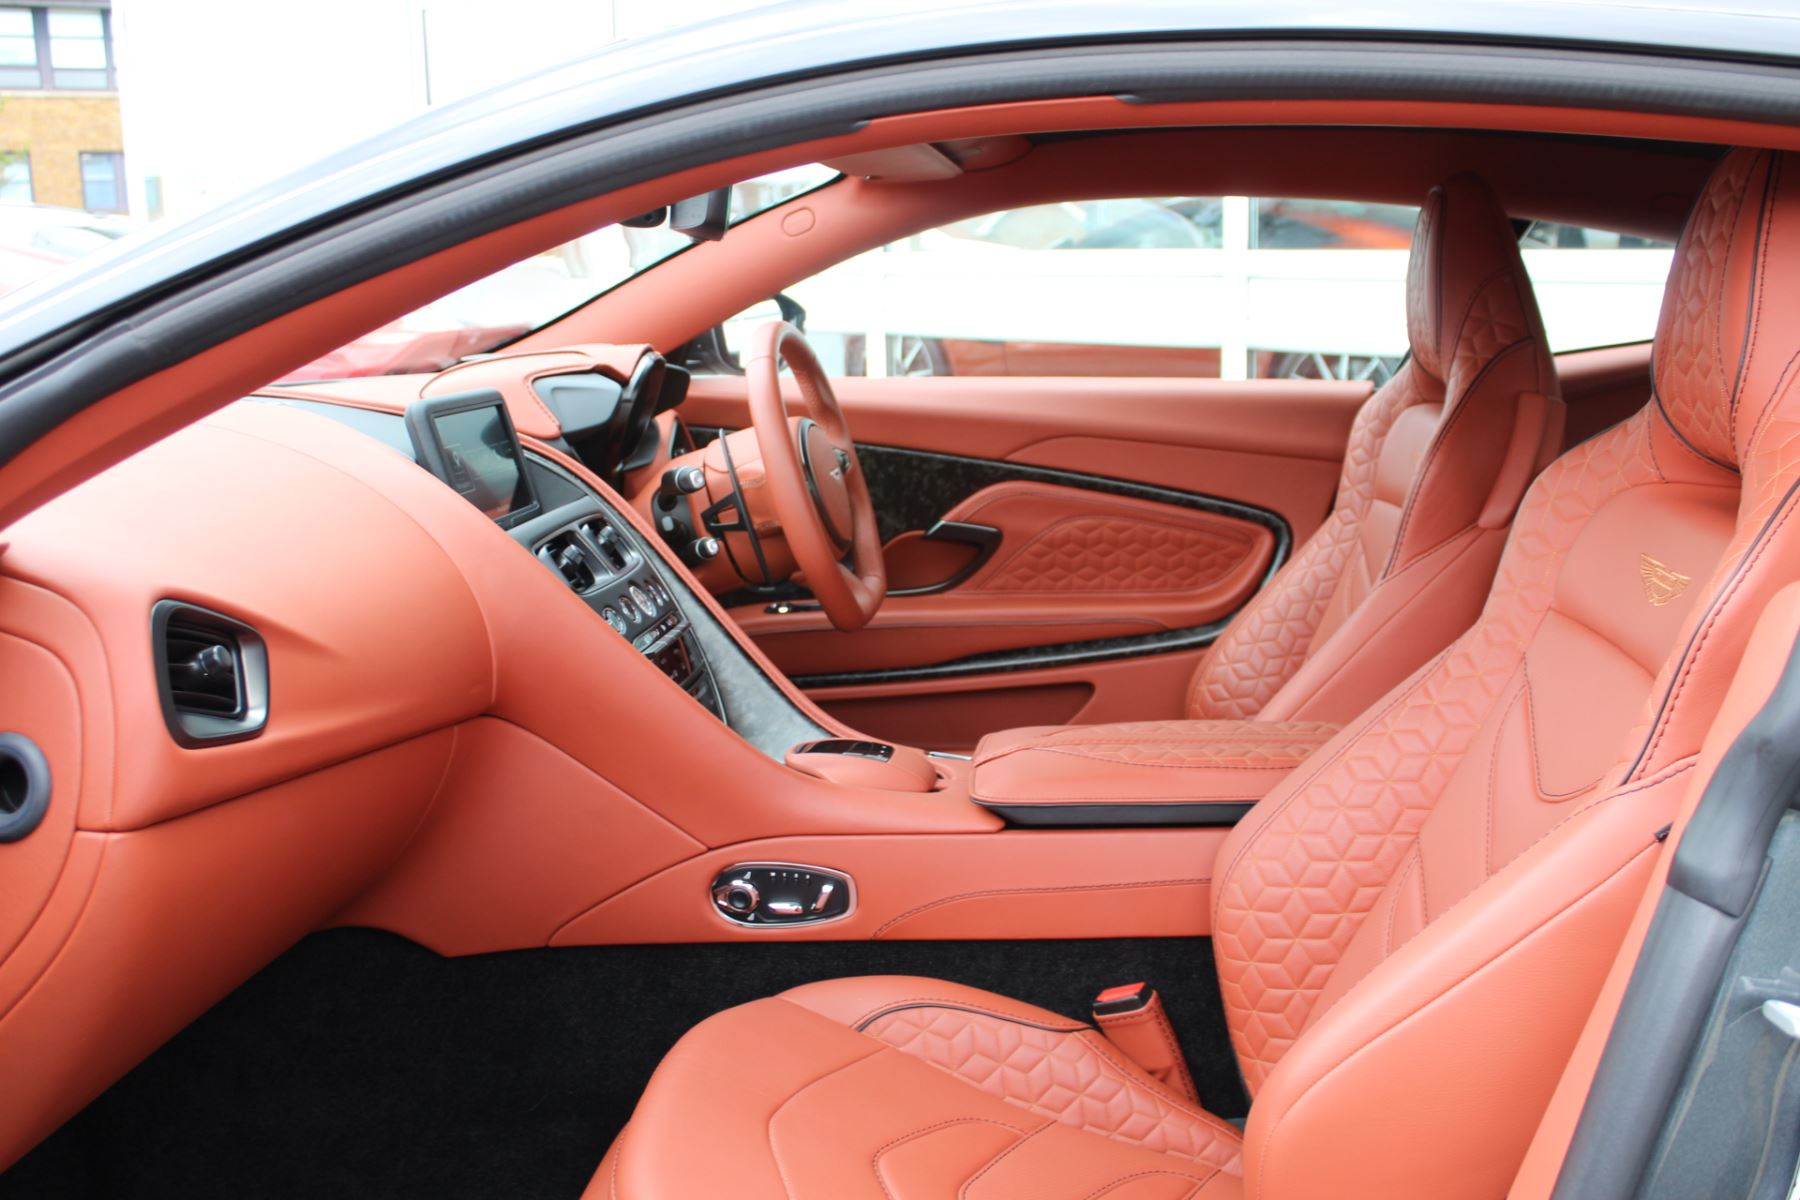 Aston Martin DBS V12 Superleggera 2dr Touchtronic image 15